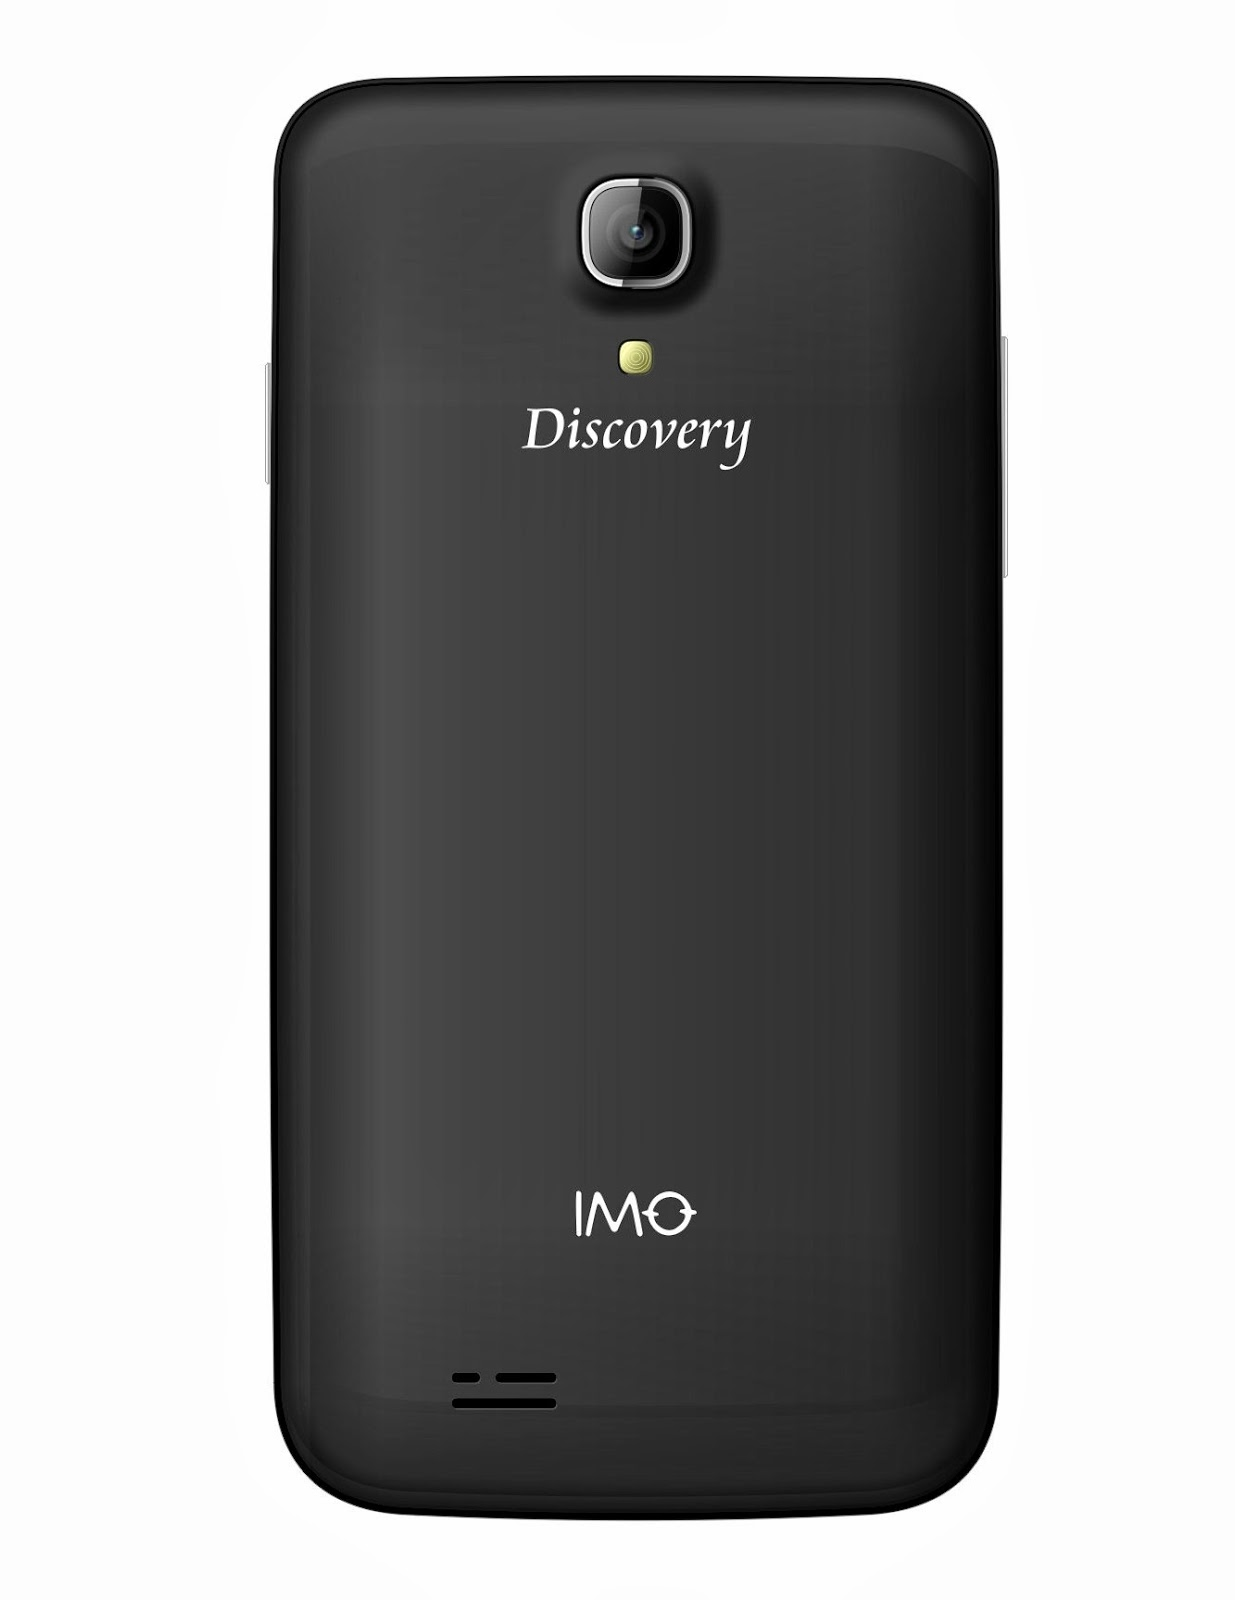 Spesifikasi Dan Harga Imo X6 Tablet S67 Thunder Gambar Discovery 2 Ponsel